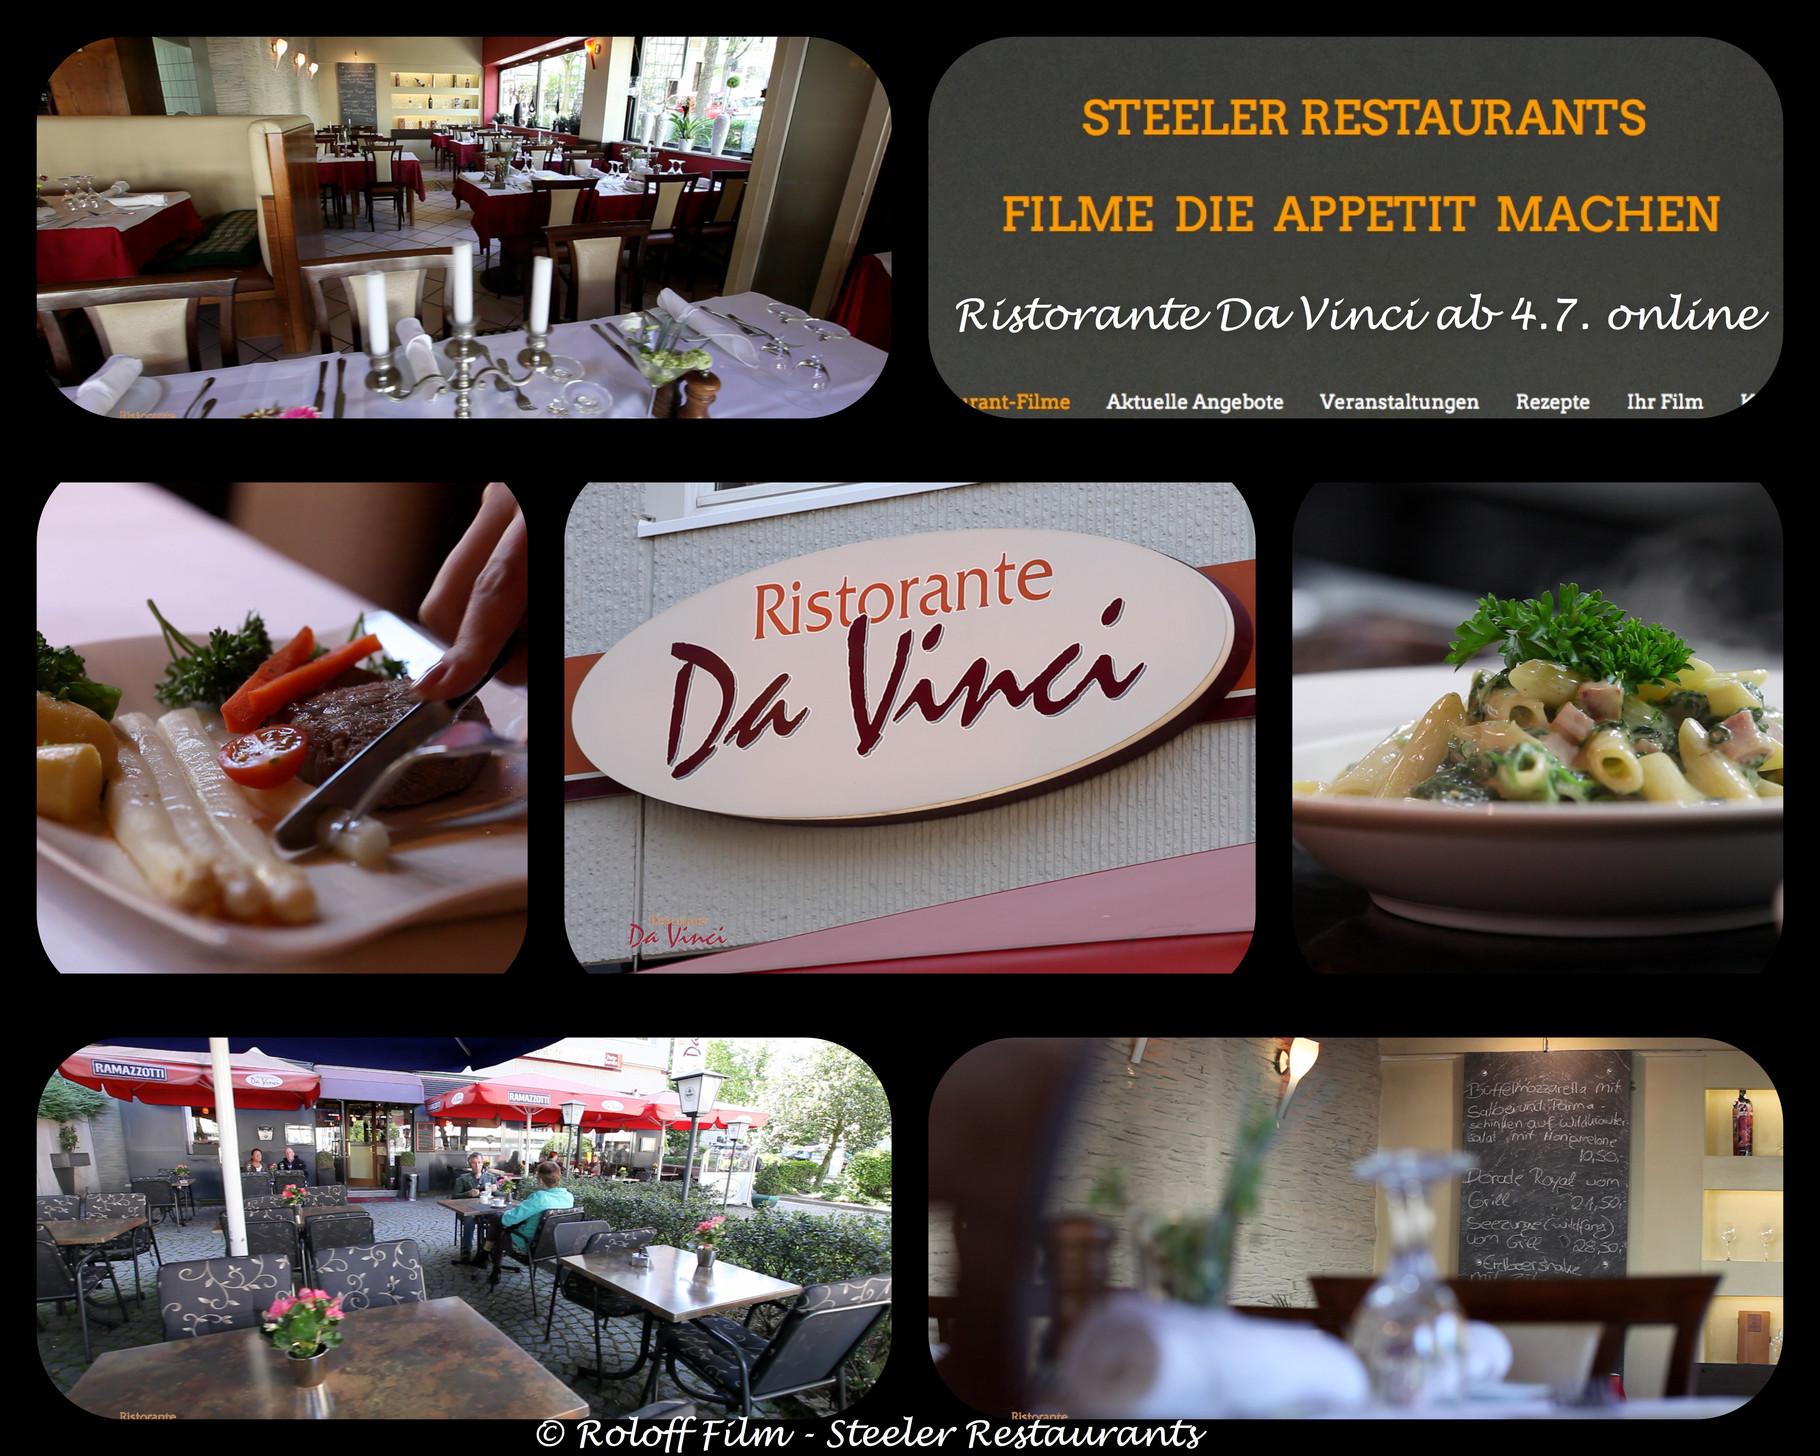 Ristorante Da Vinci - Restaurants in Essen